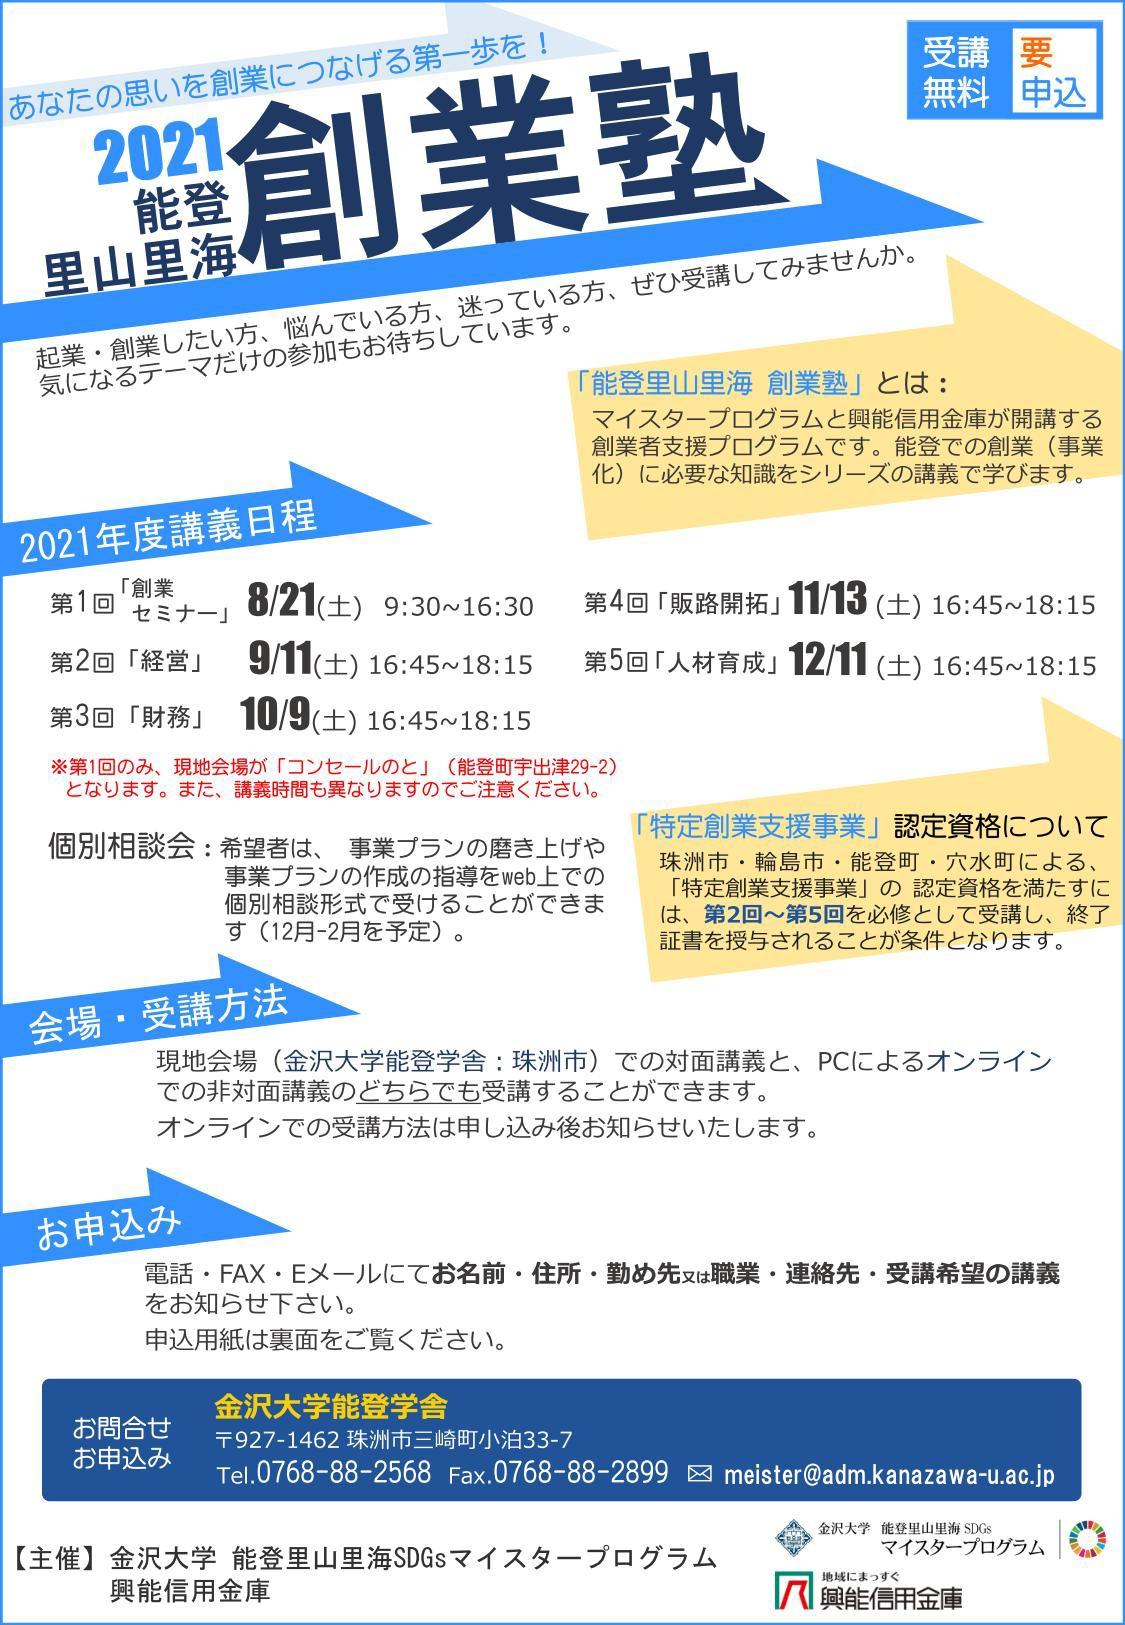 sougyou2021_01.jpg